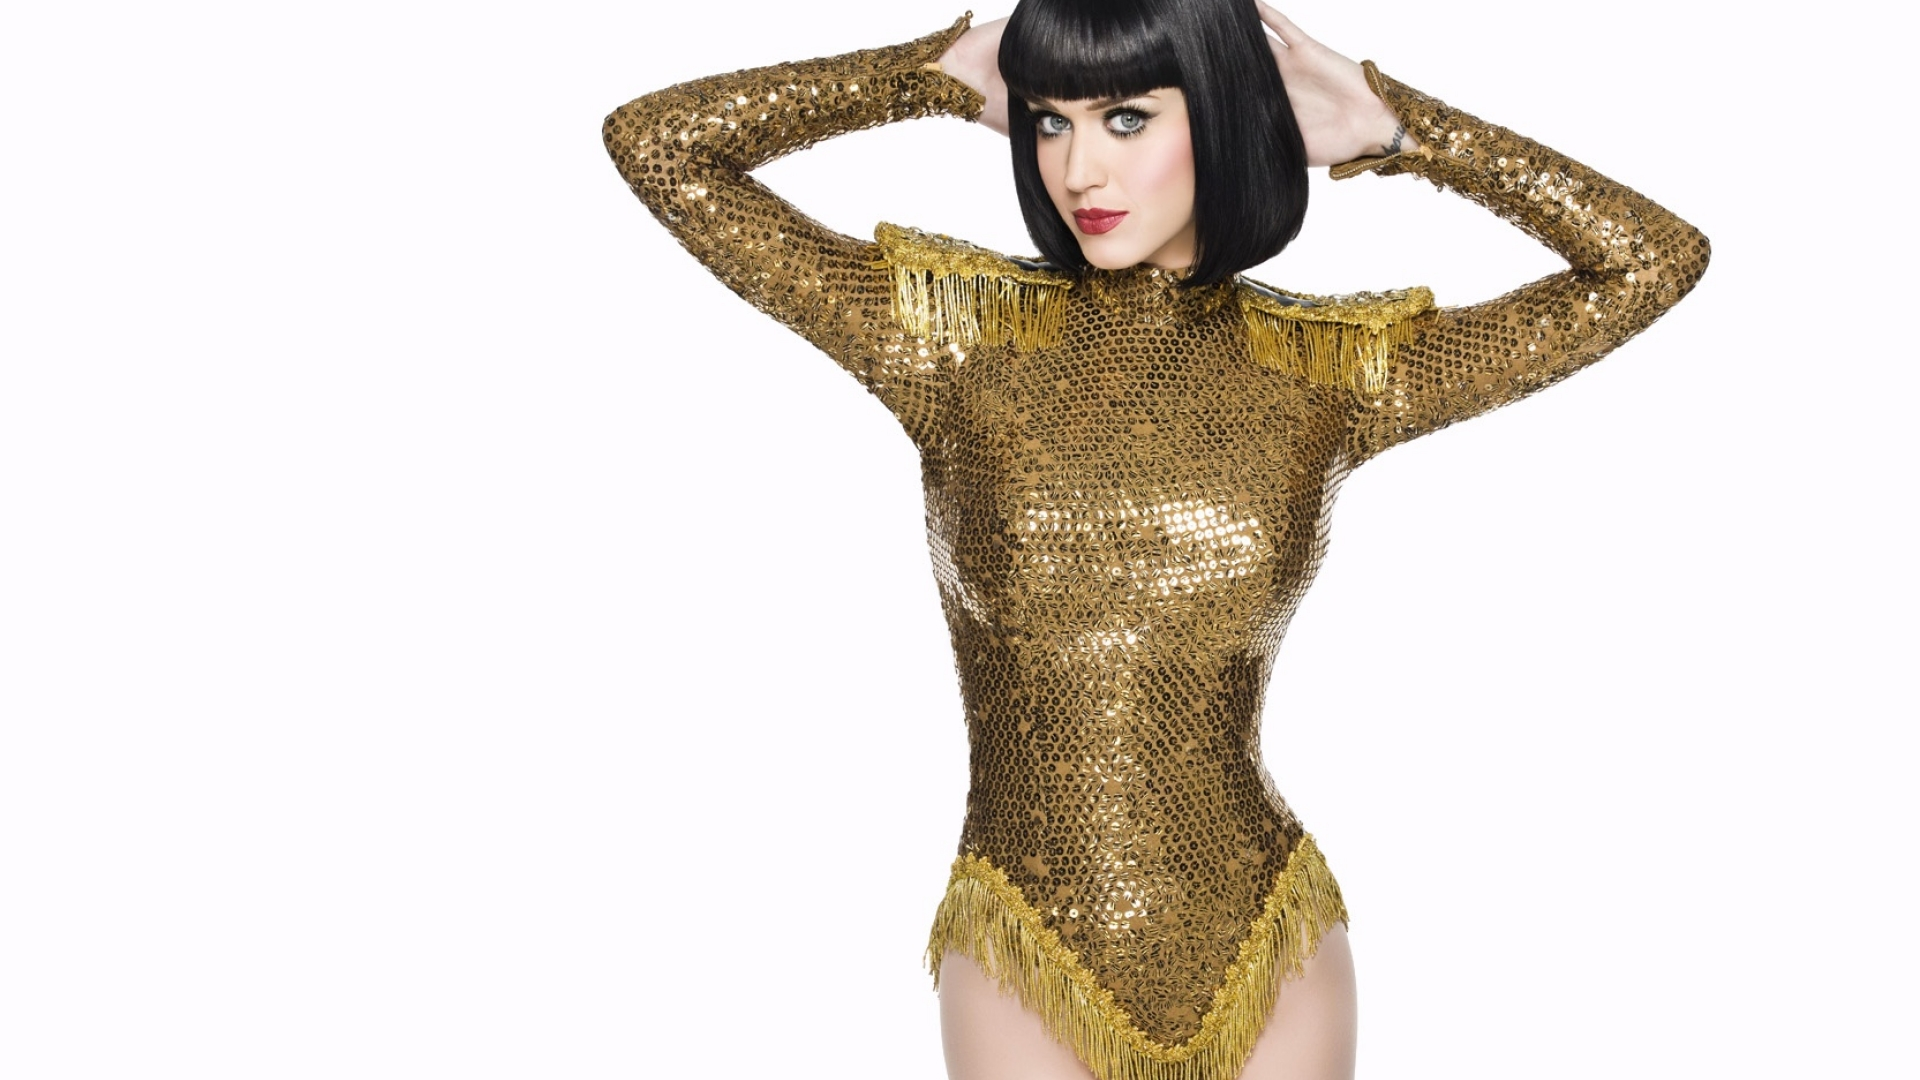 Katy Perry glittery wallpaper